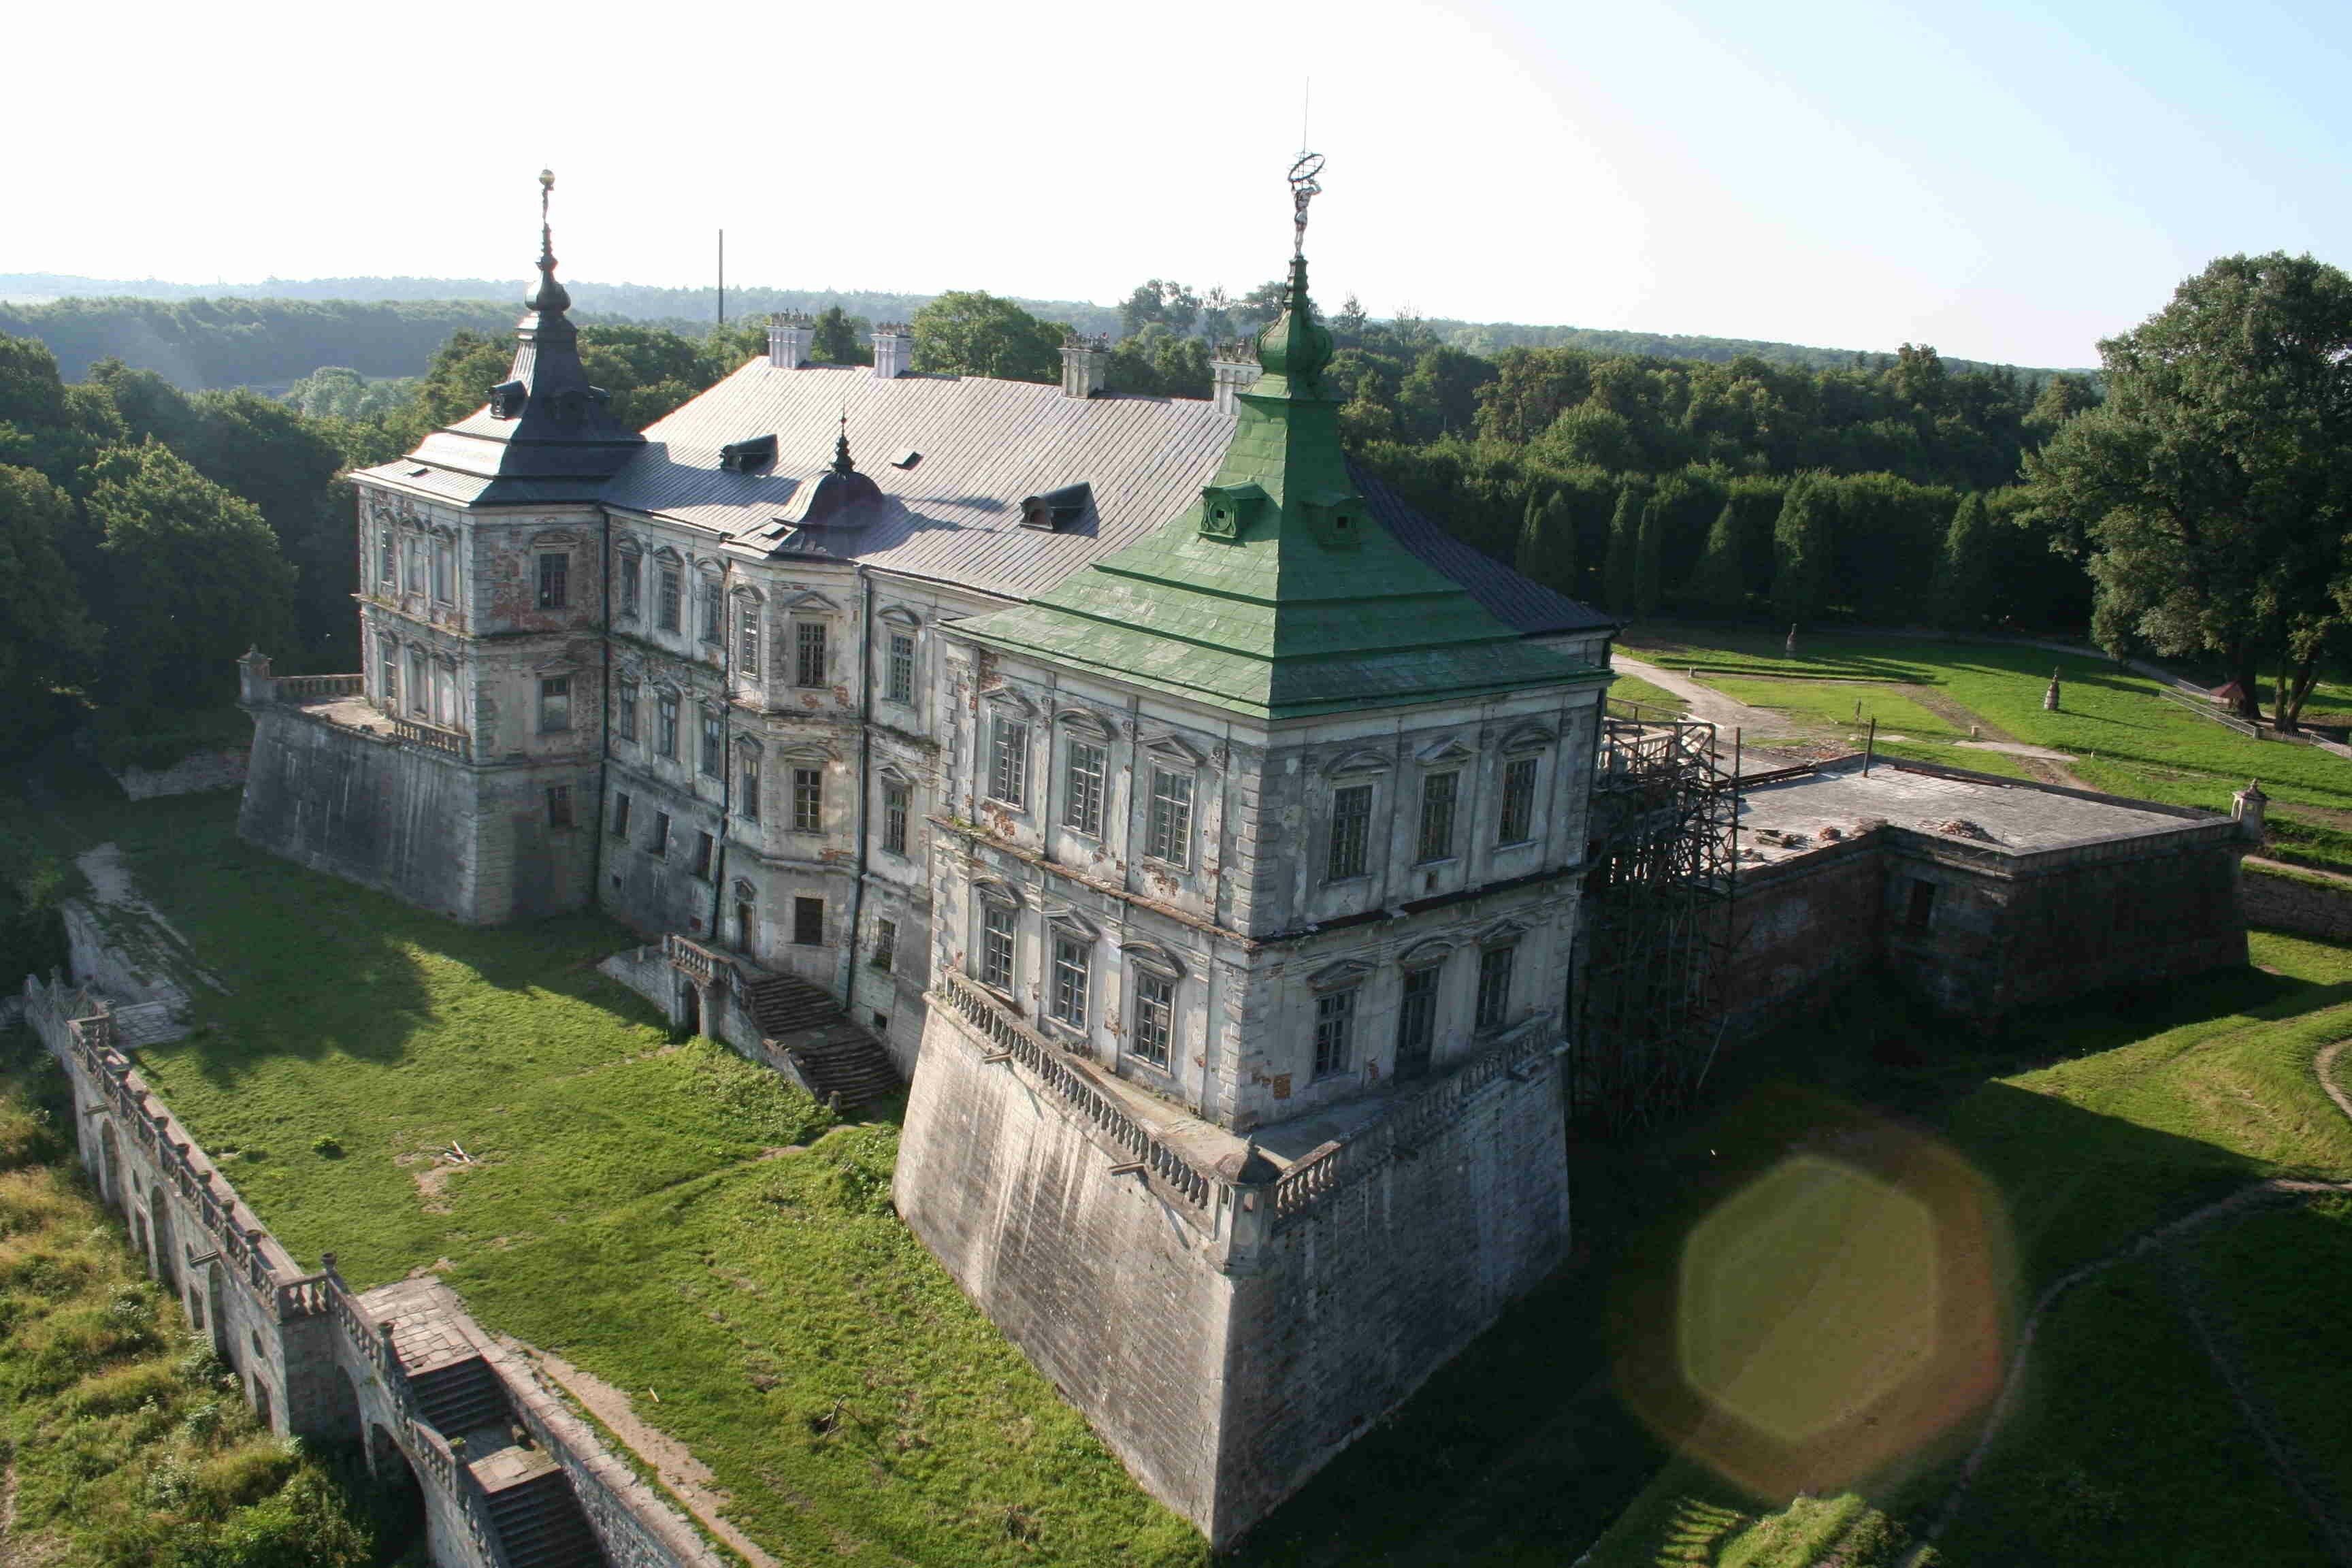 Подорож Україною: Підгорецький замок - український Версаль - InfoMIX